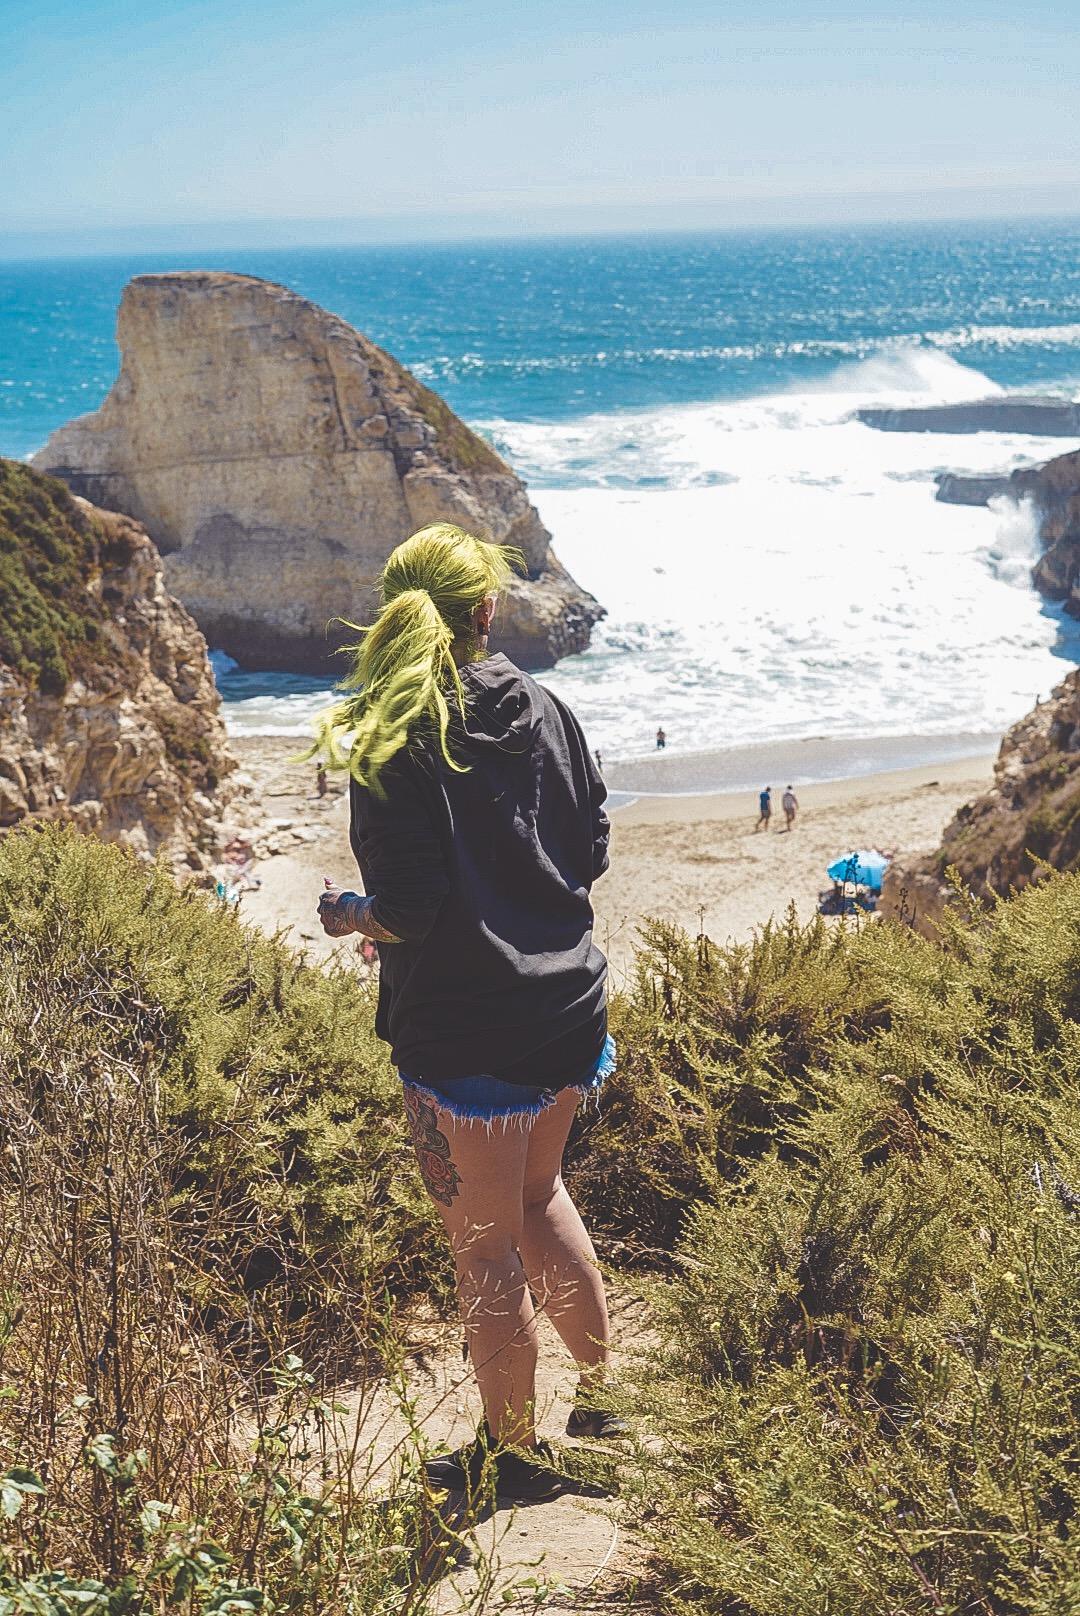 Shark Fin Cove- Highway 1 California-The Chaos Collective